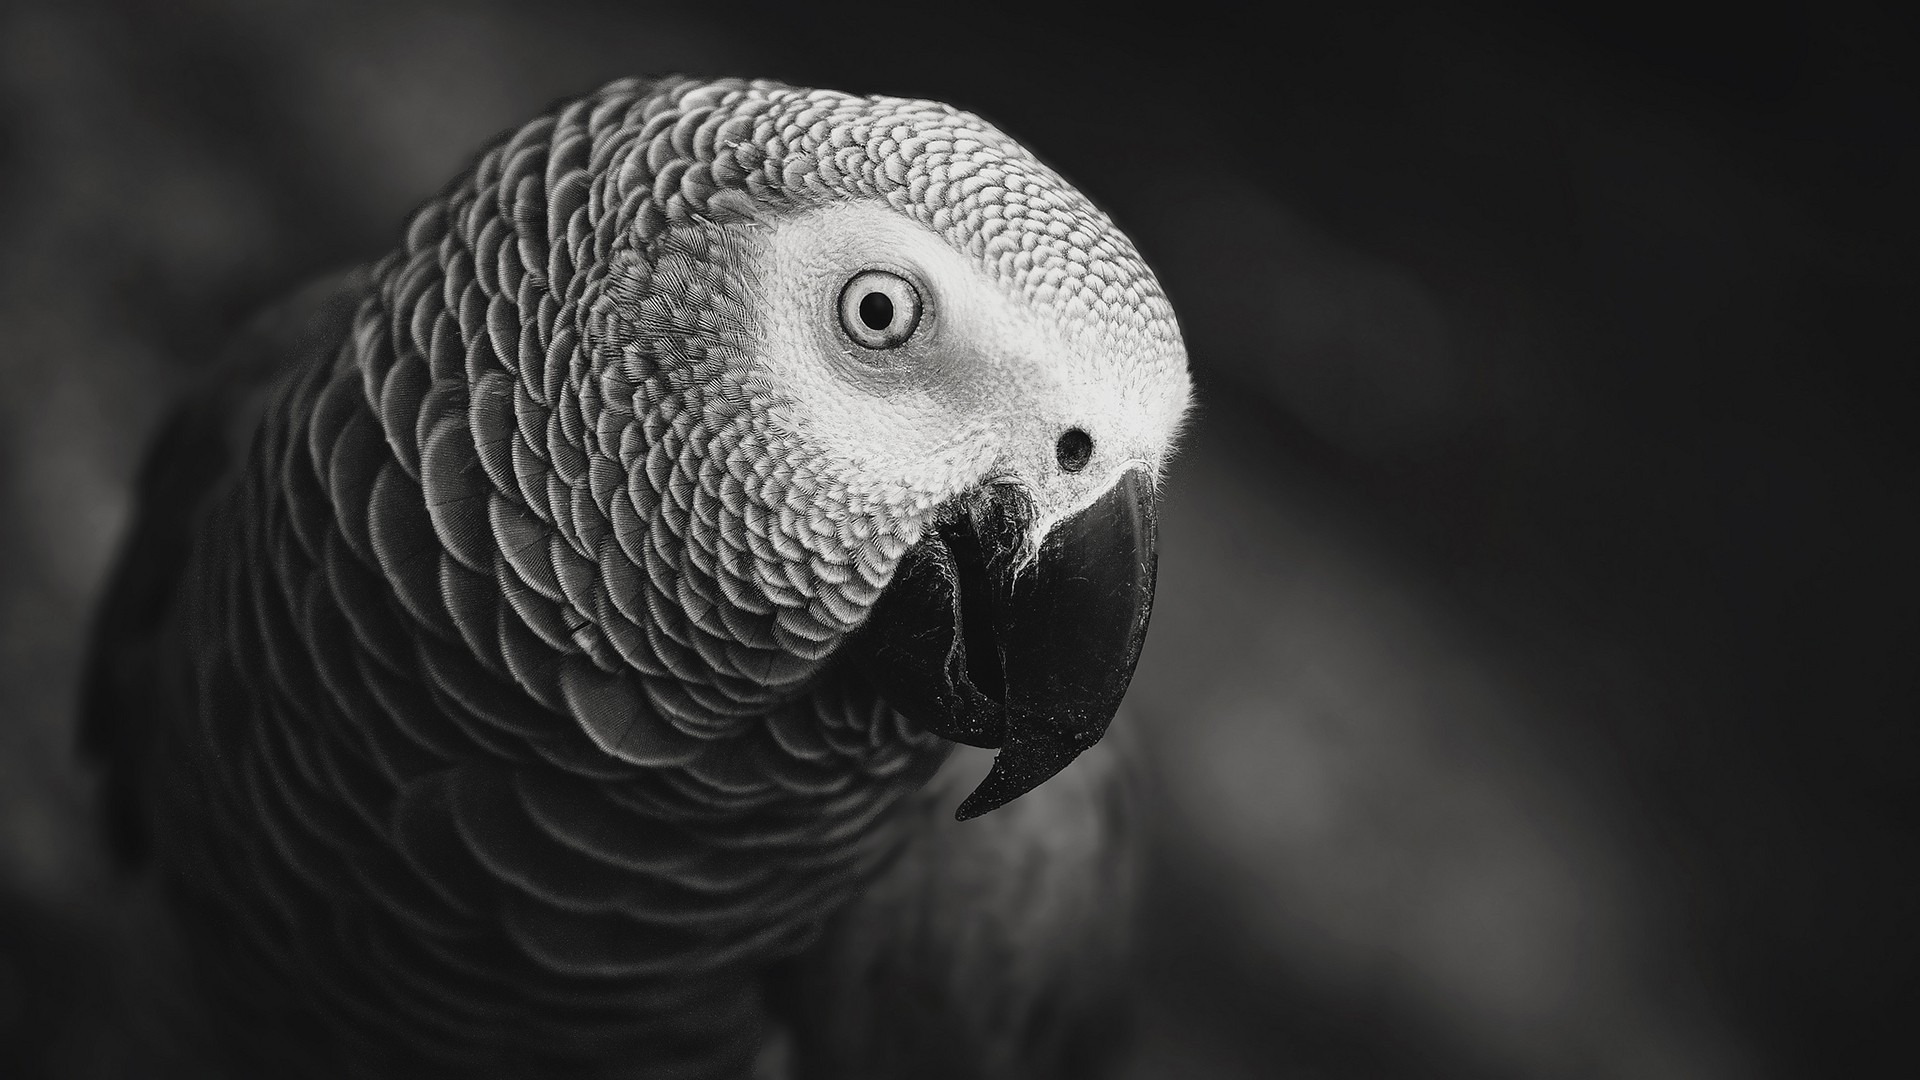 General 1920x1080 nature animals gray macro monochrome birds